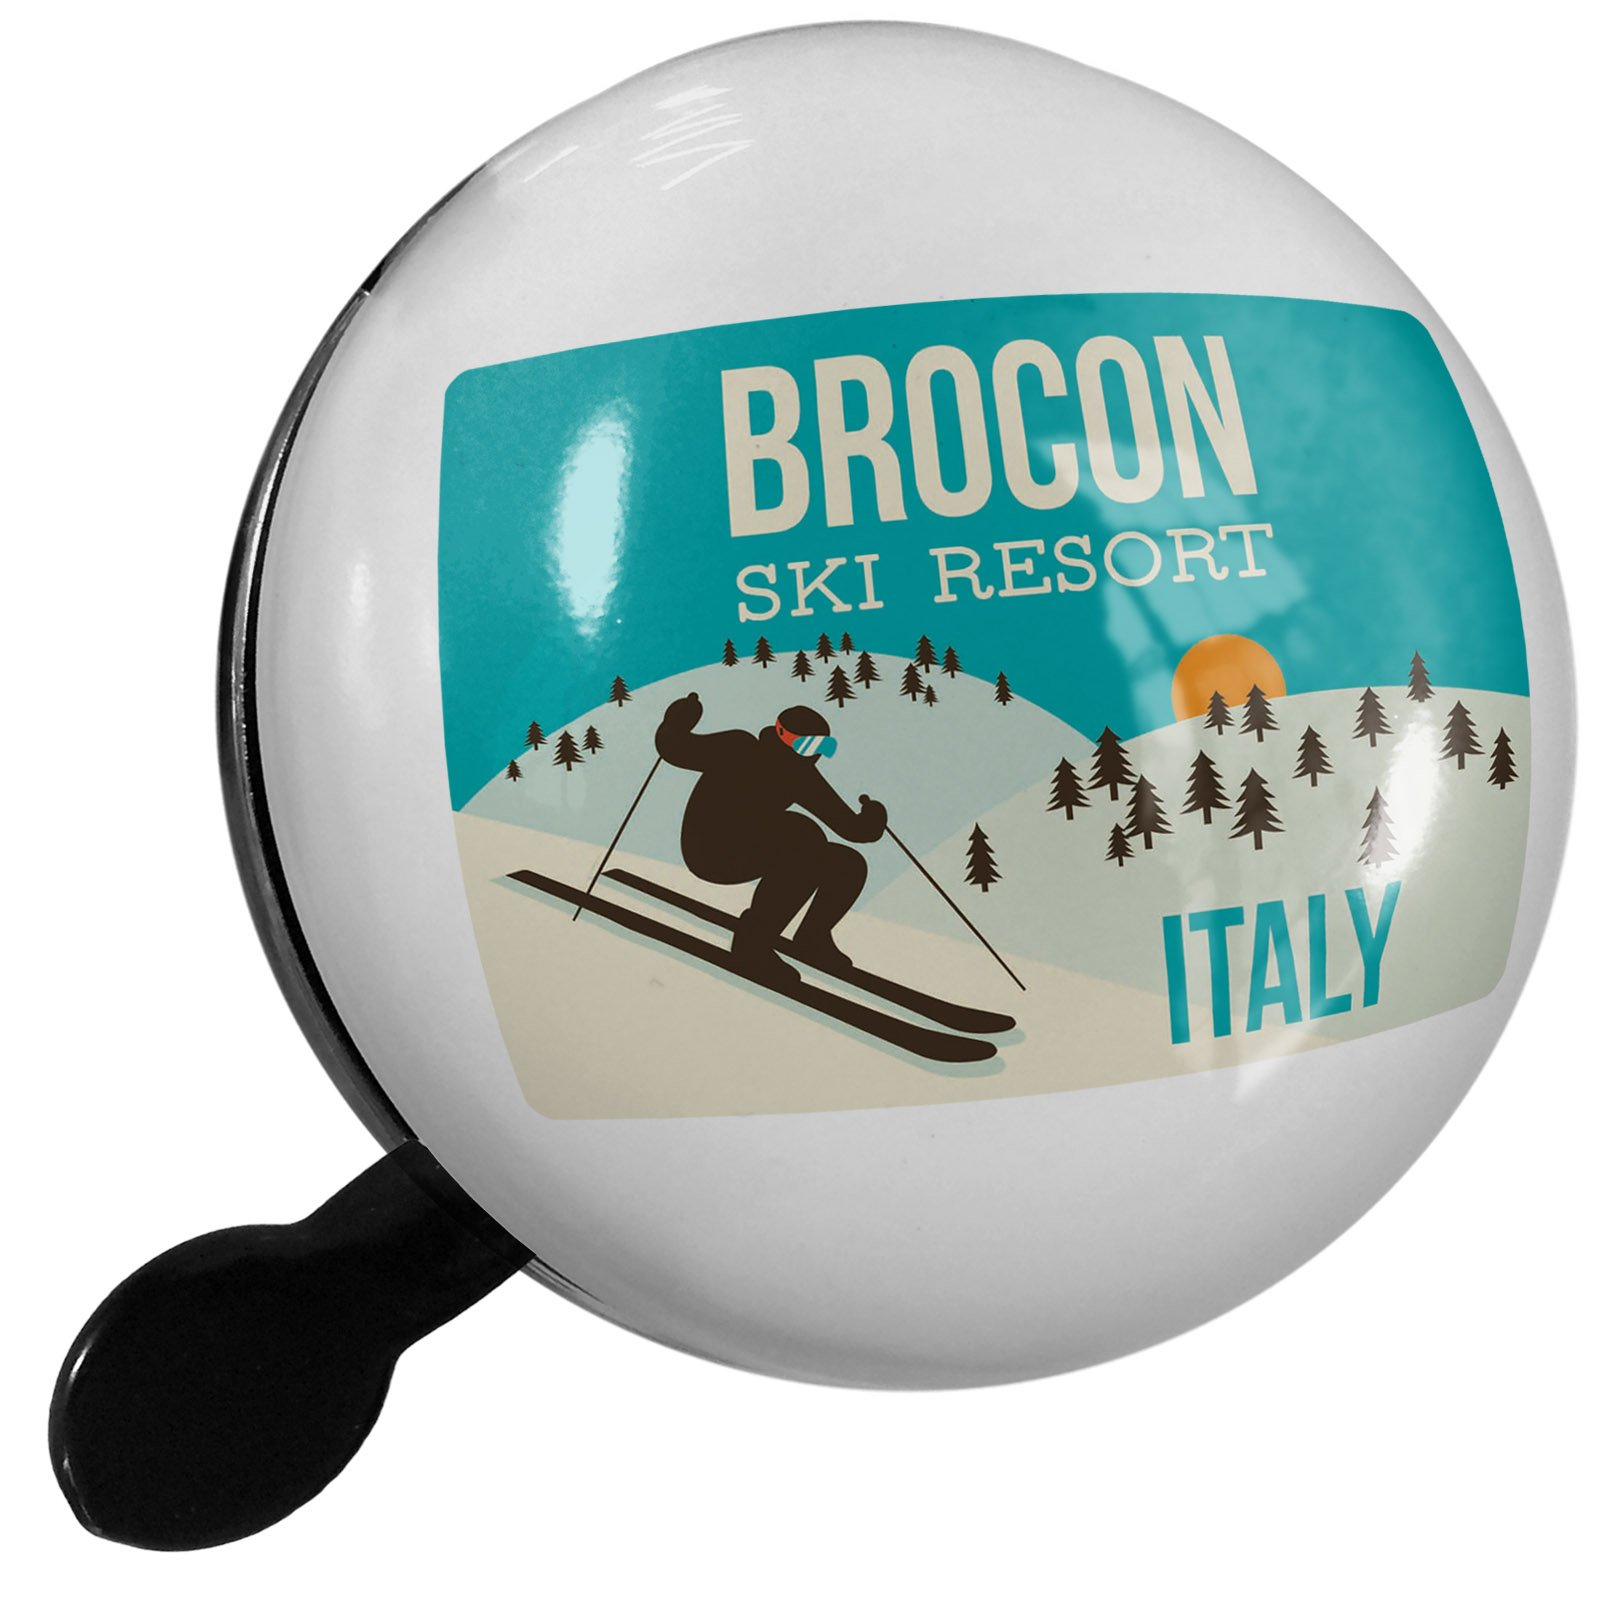 Small Bike Bell Brocon Ski Resort - Italy Ski Resort - NEONBLOND